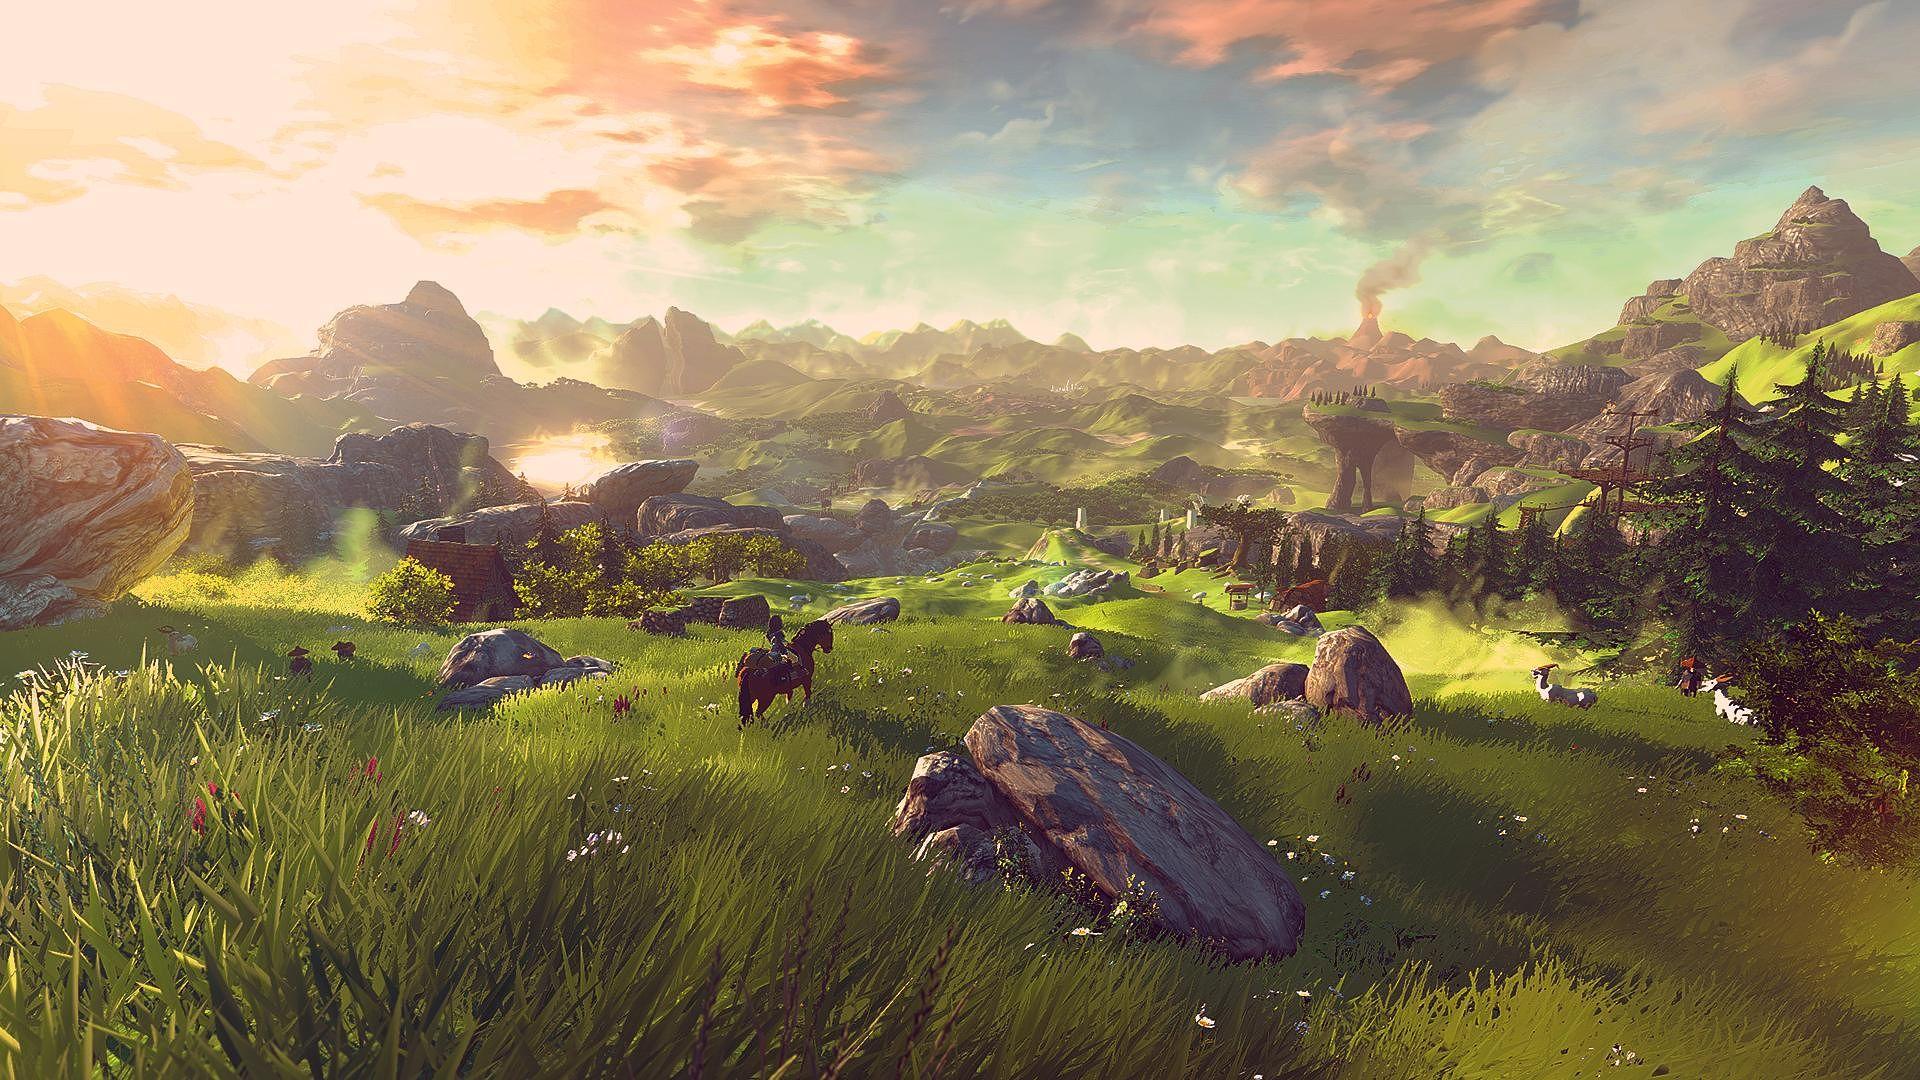 The open landscape in Zelda: Breath of the Wild.